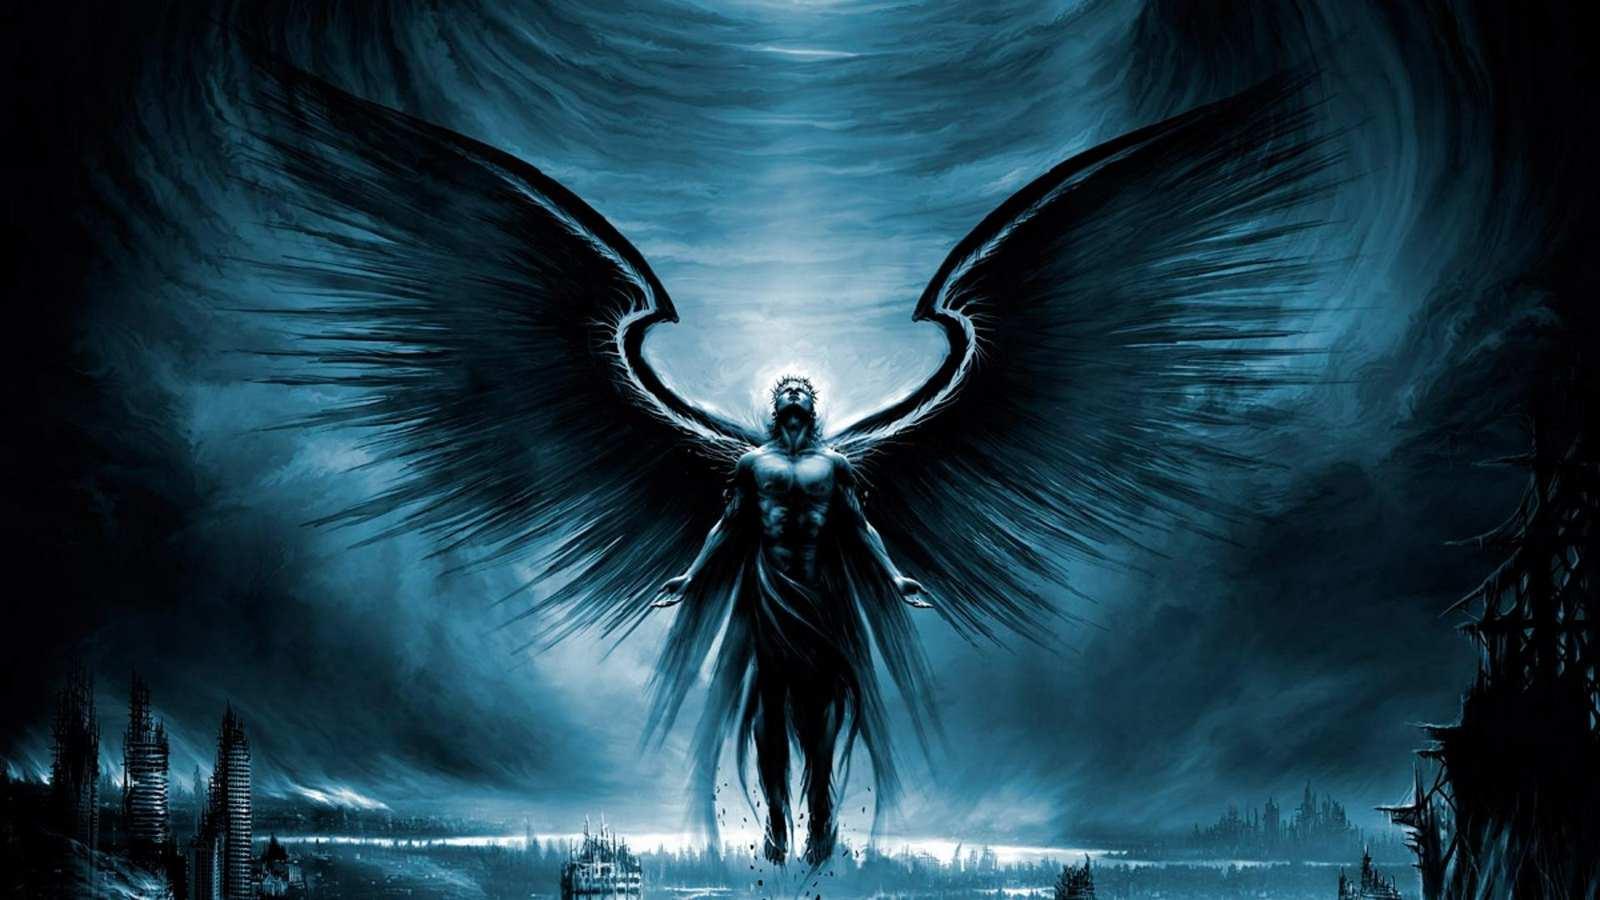 Hd wallpaper cave - 1080p Desktop The Dark Angel Pc Desktop Hd Wallpaper P The